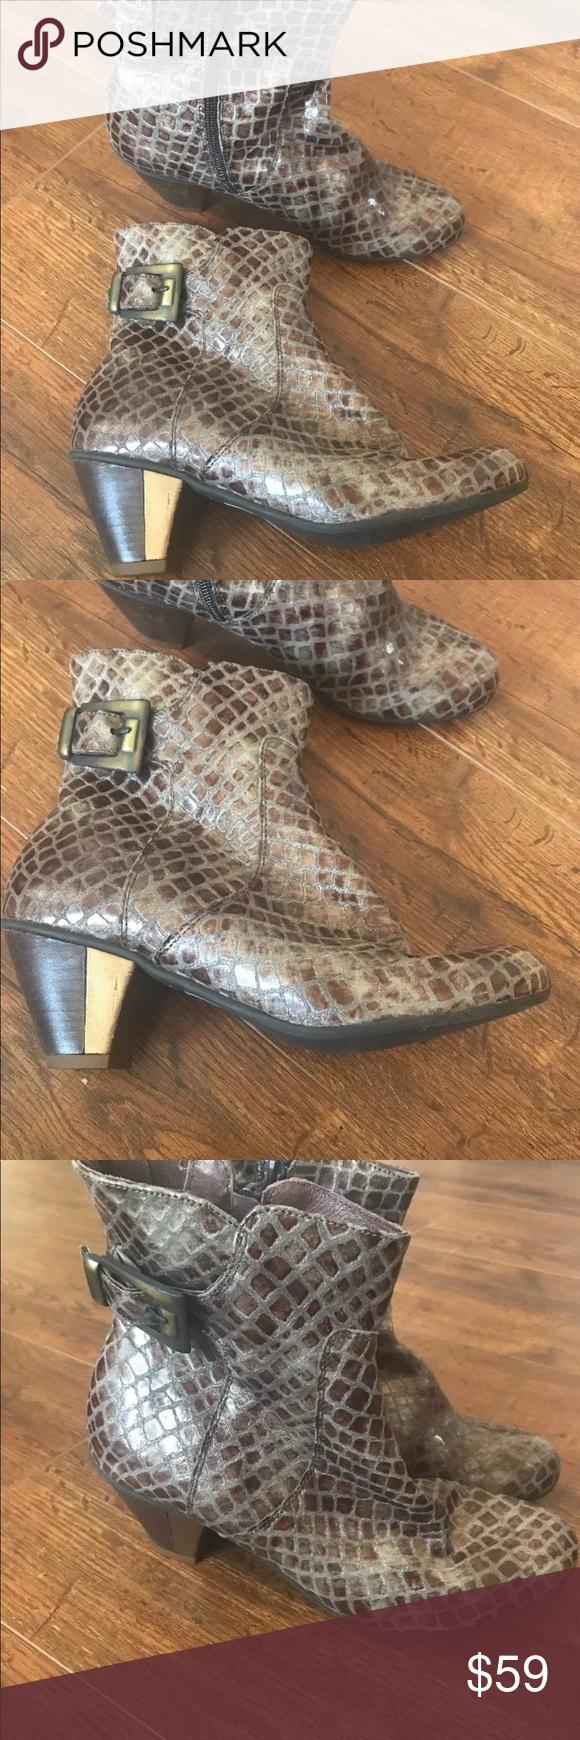 serval sandals outlet women largest australia australiaoutlet s comforter store storelargest shoes helle fashion comfort womens p buy brown tula au